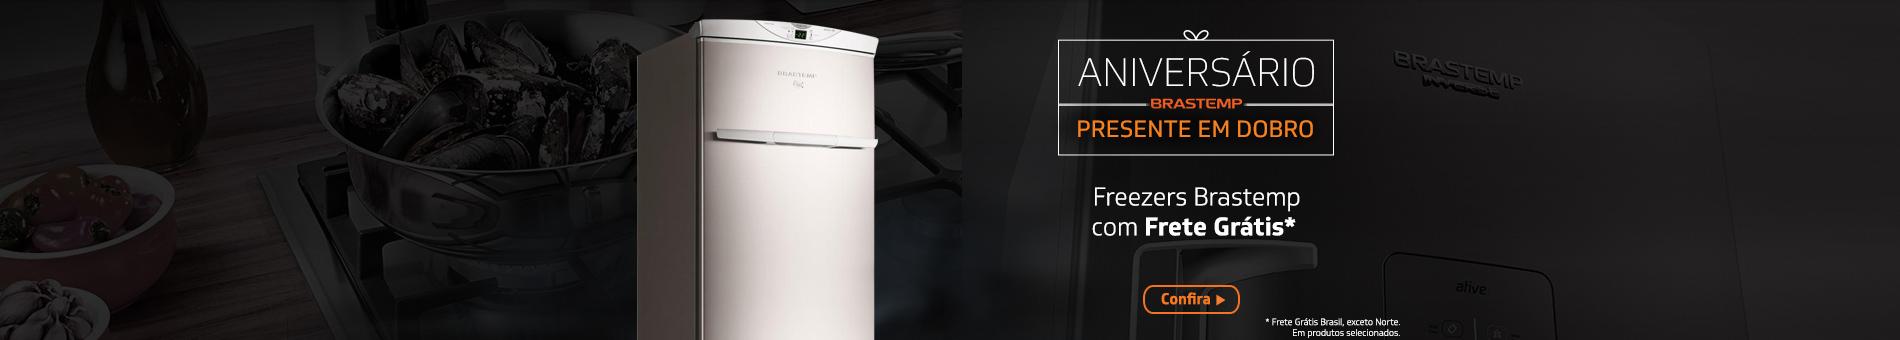 Promoção Interna - 763 - presenteemdobro_freezers_home5_24082016 - freezers - 5